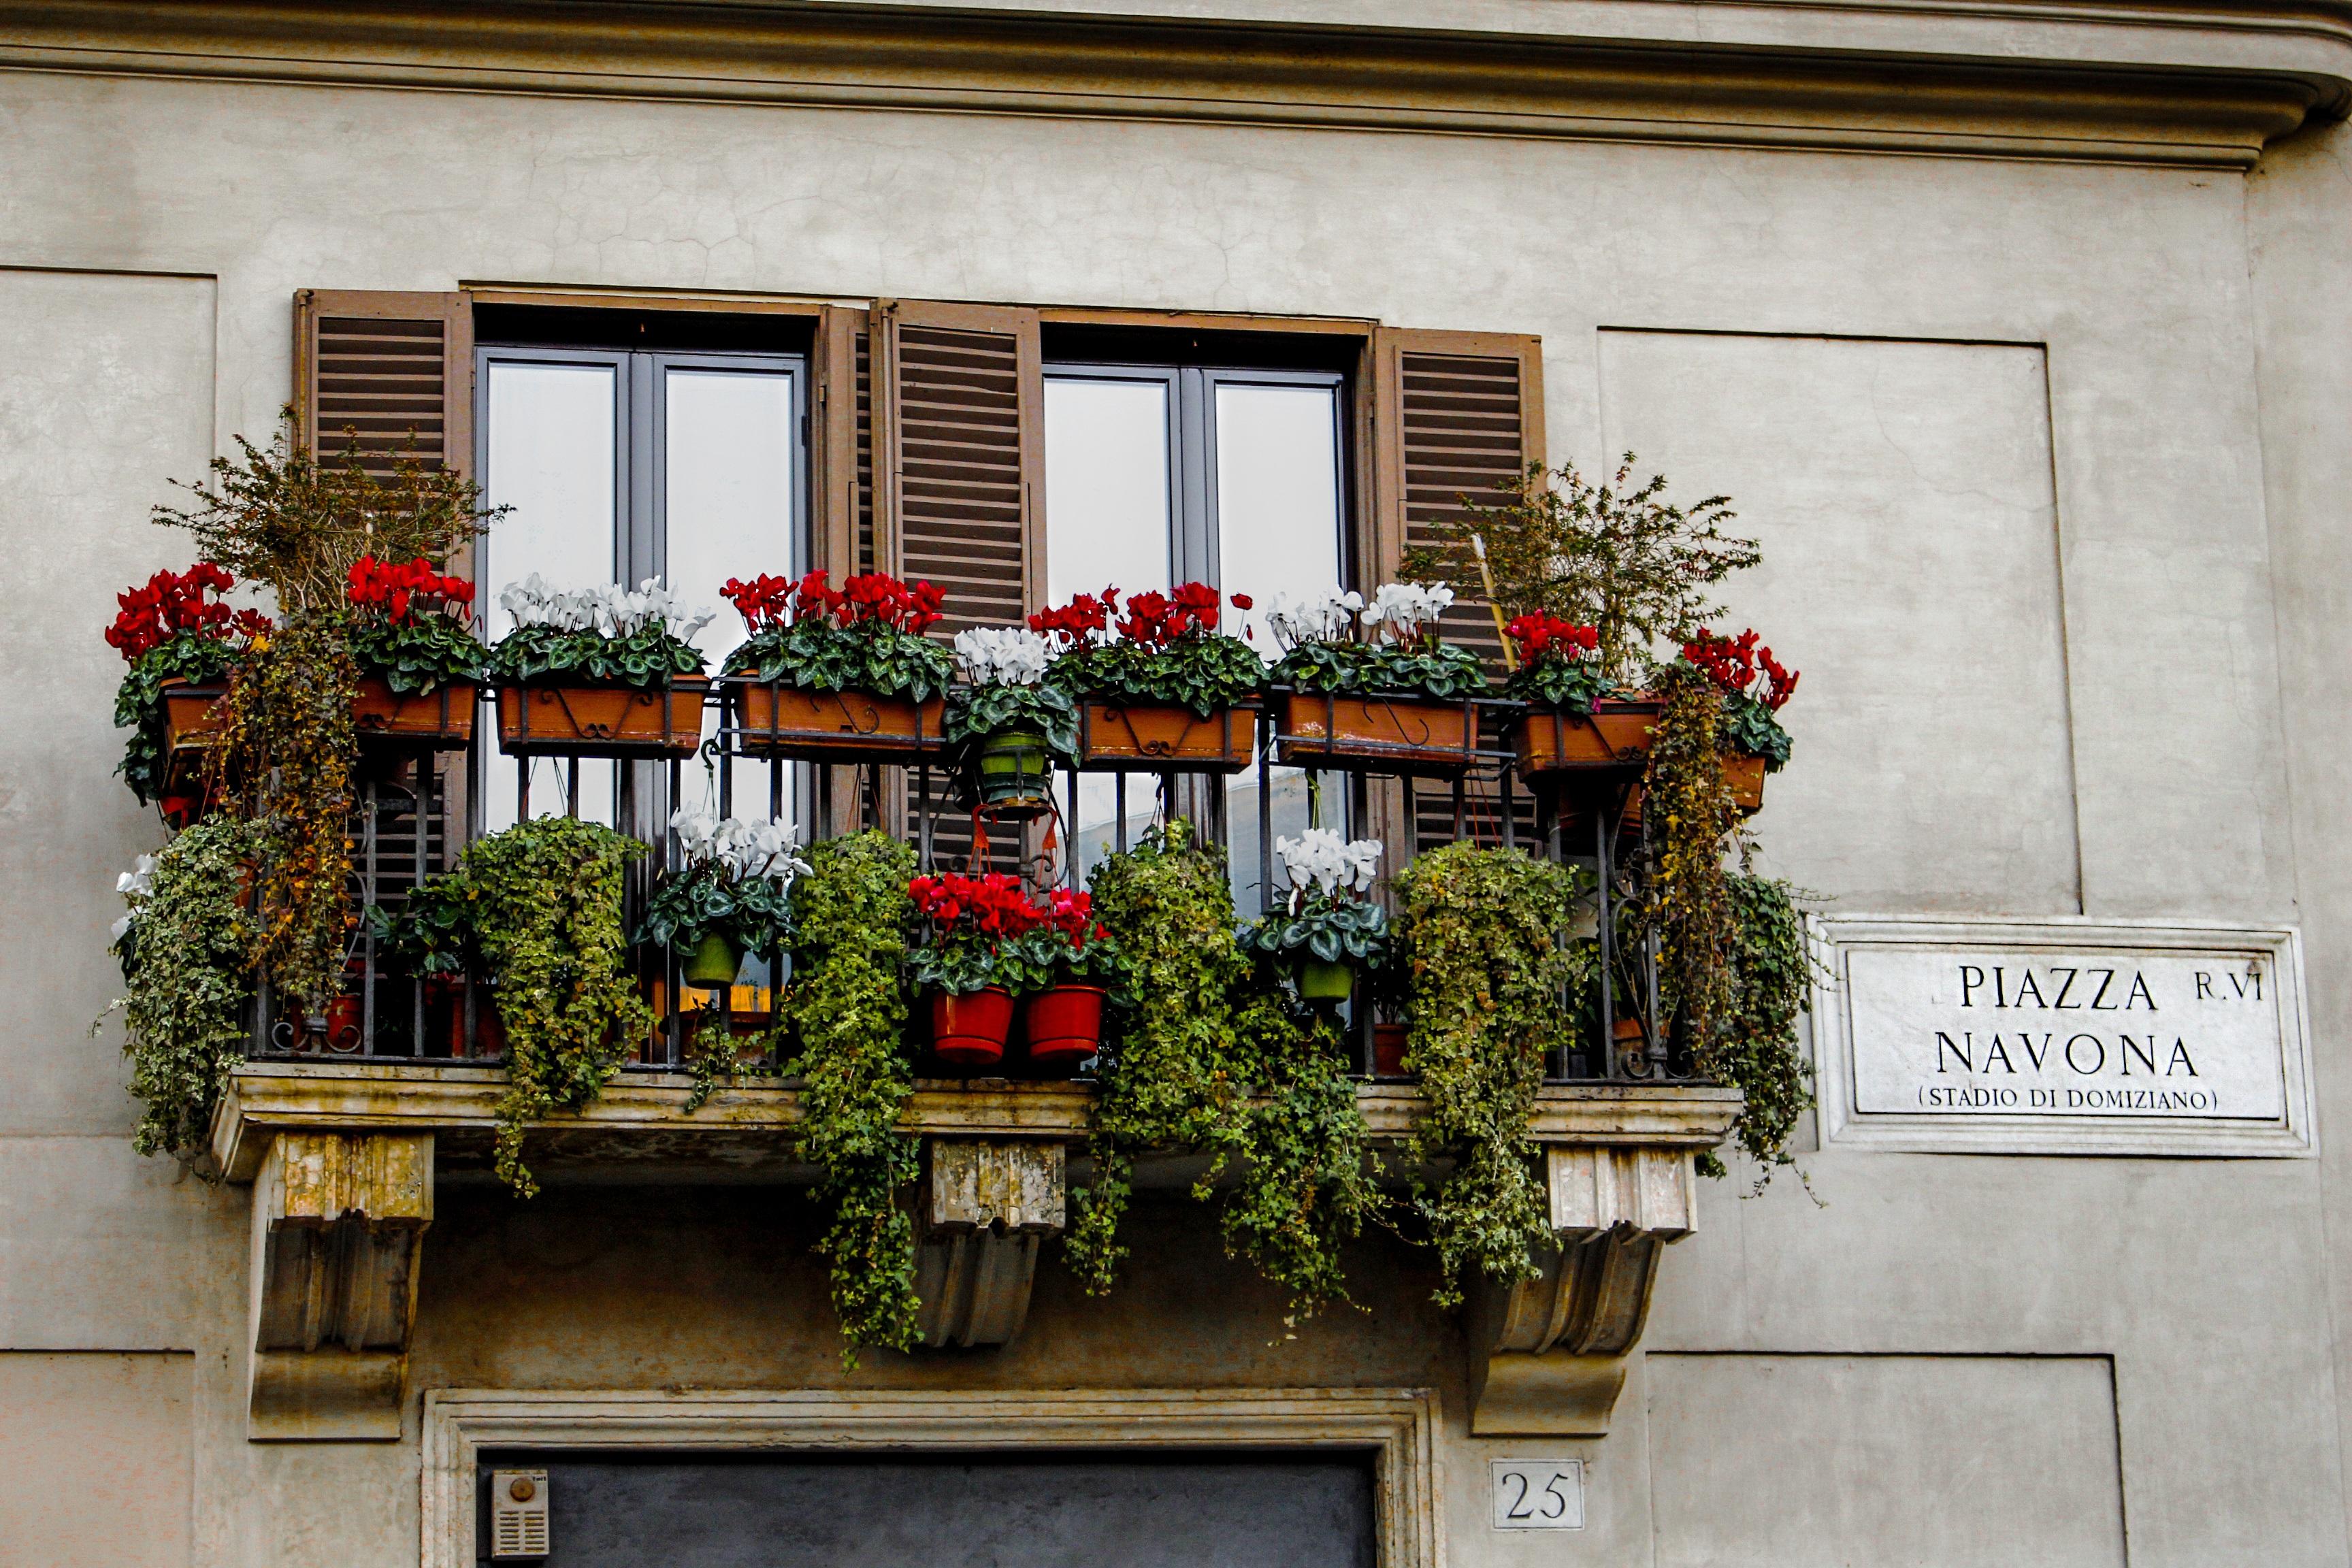 Gambar Rumah Jendela Restoran Balkon Italia Penglihatan